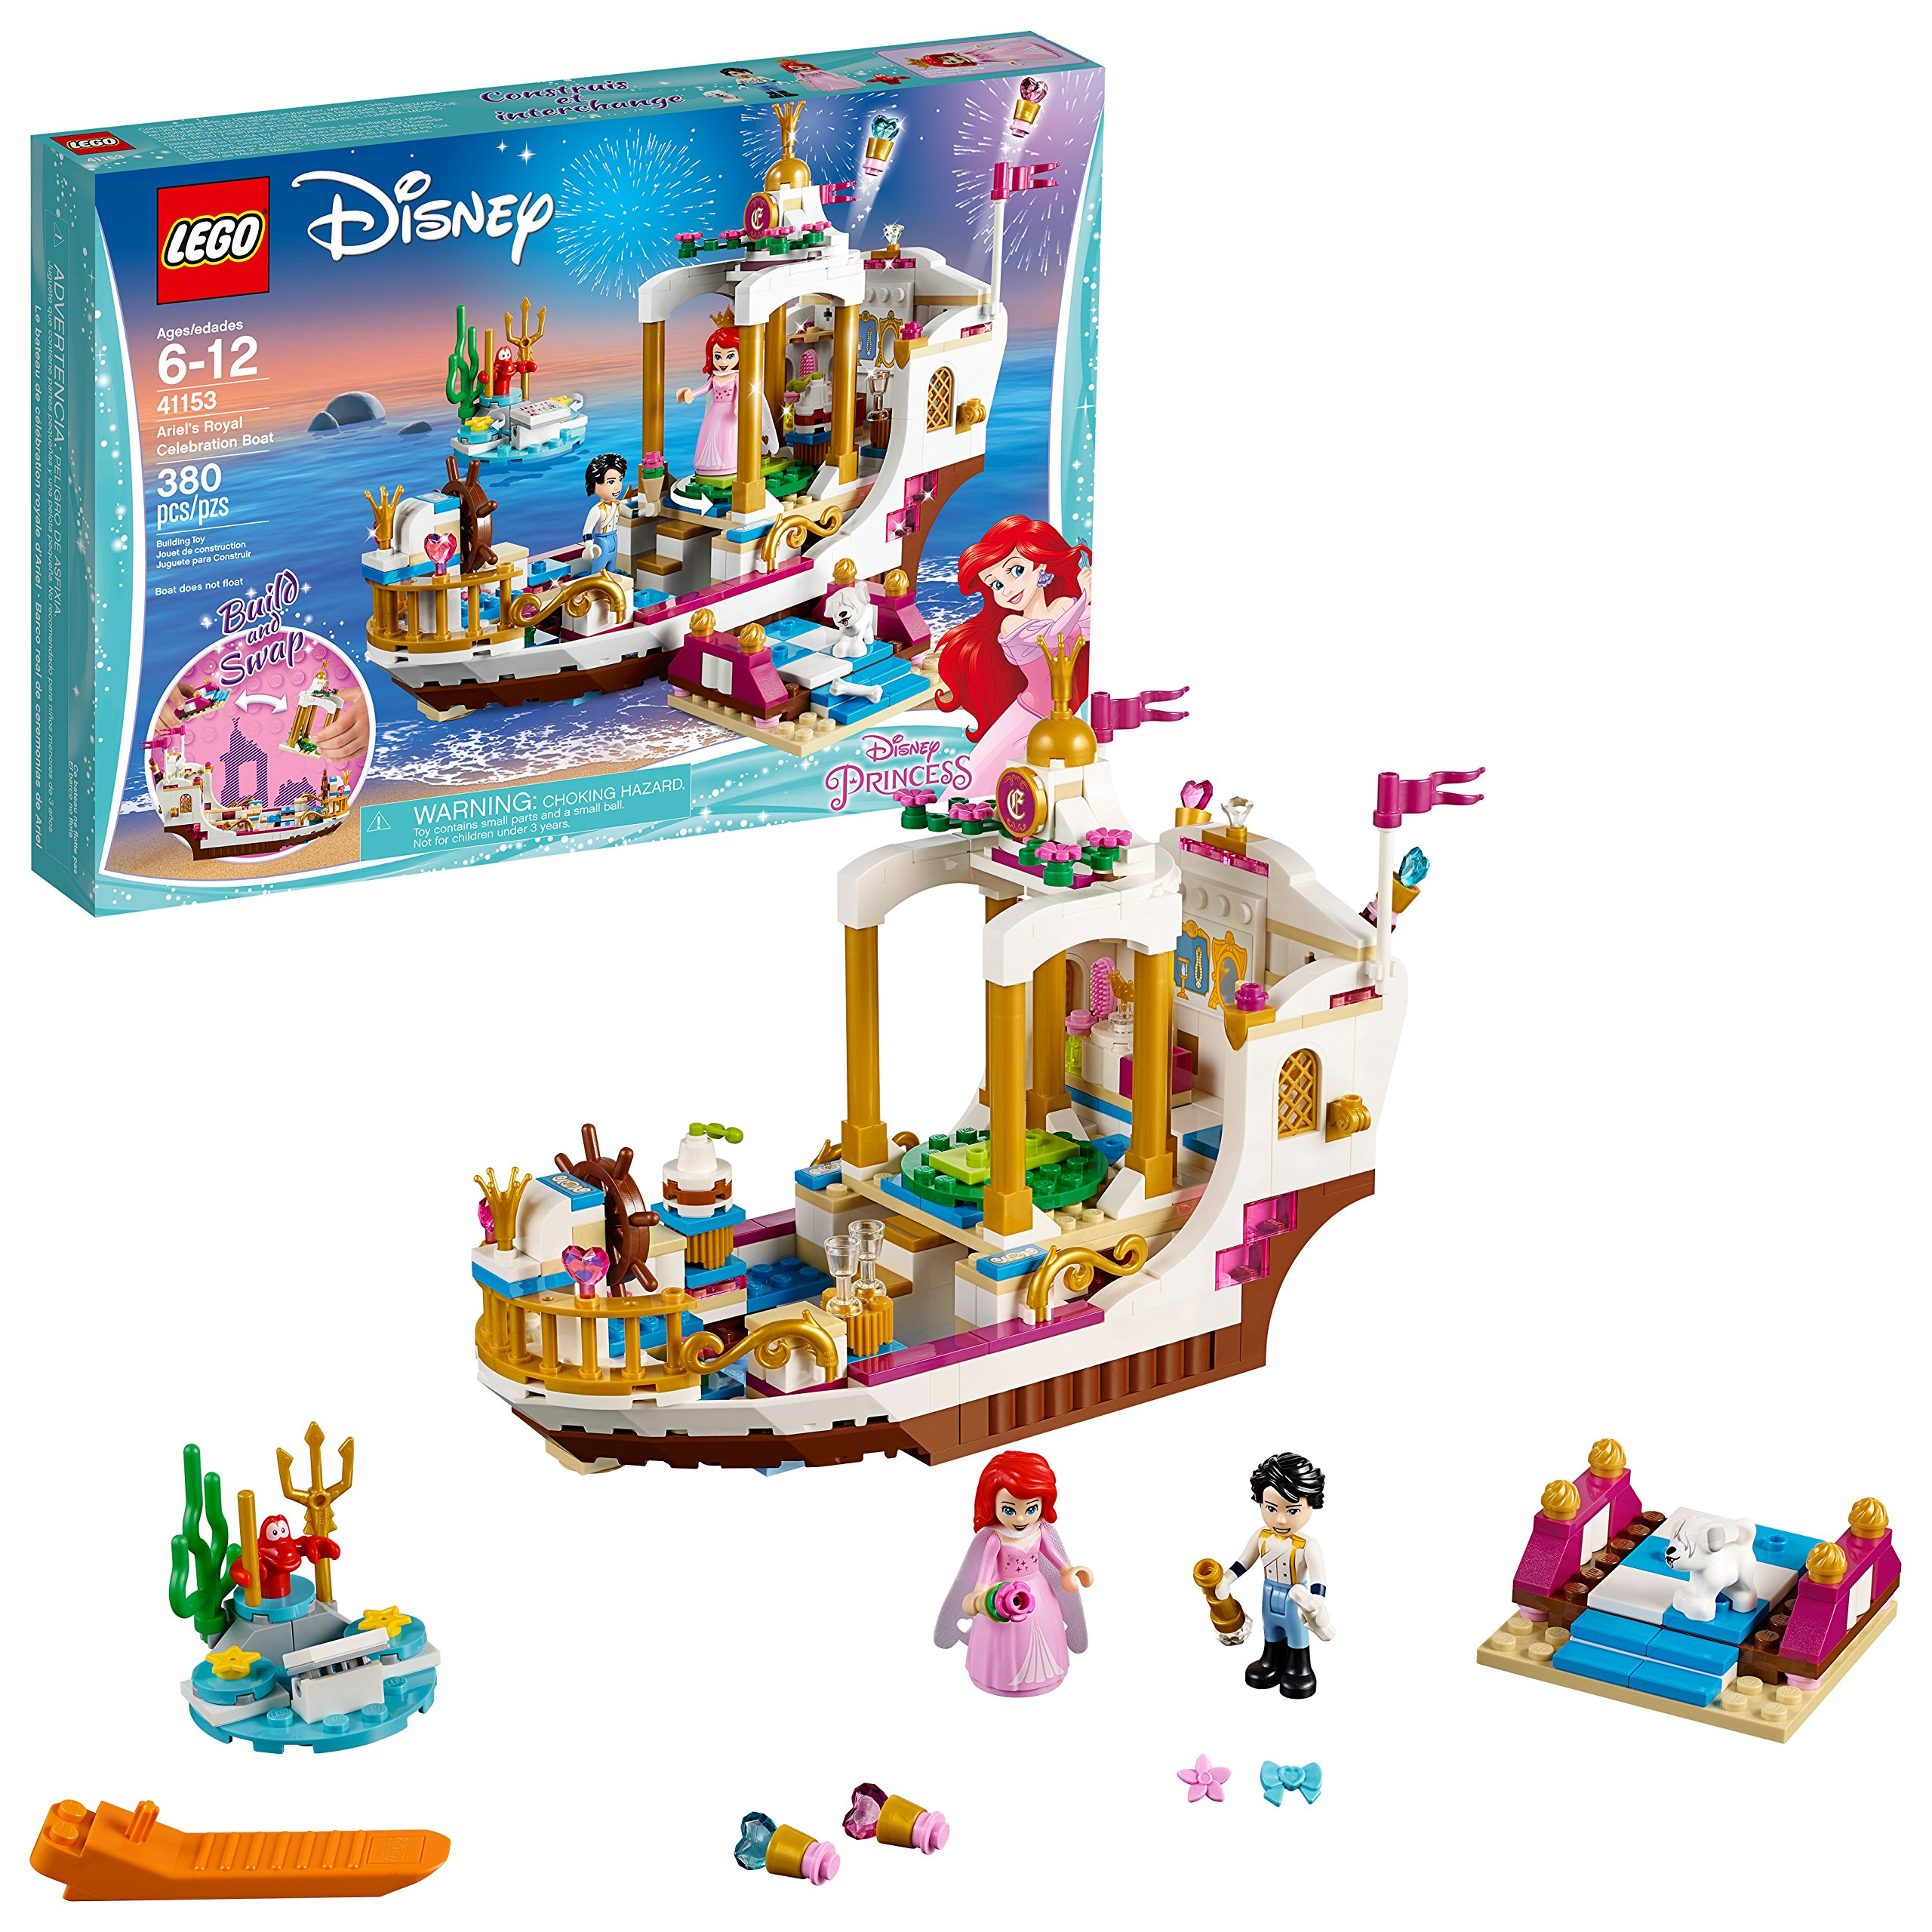 LEGO Disney Princess Ariel's Royal Celebration Boat 41153 Children's Toy Construction Set (380 Pieces) by LEGO